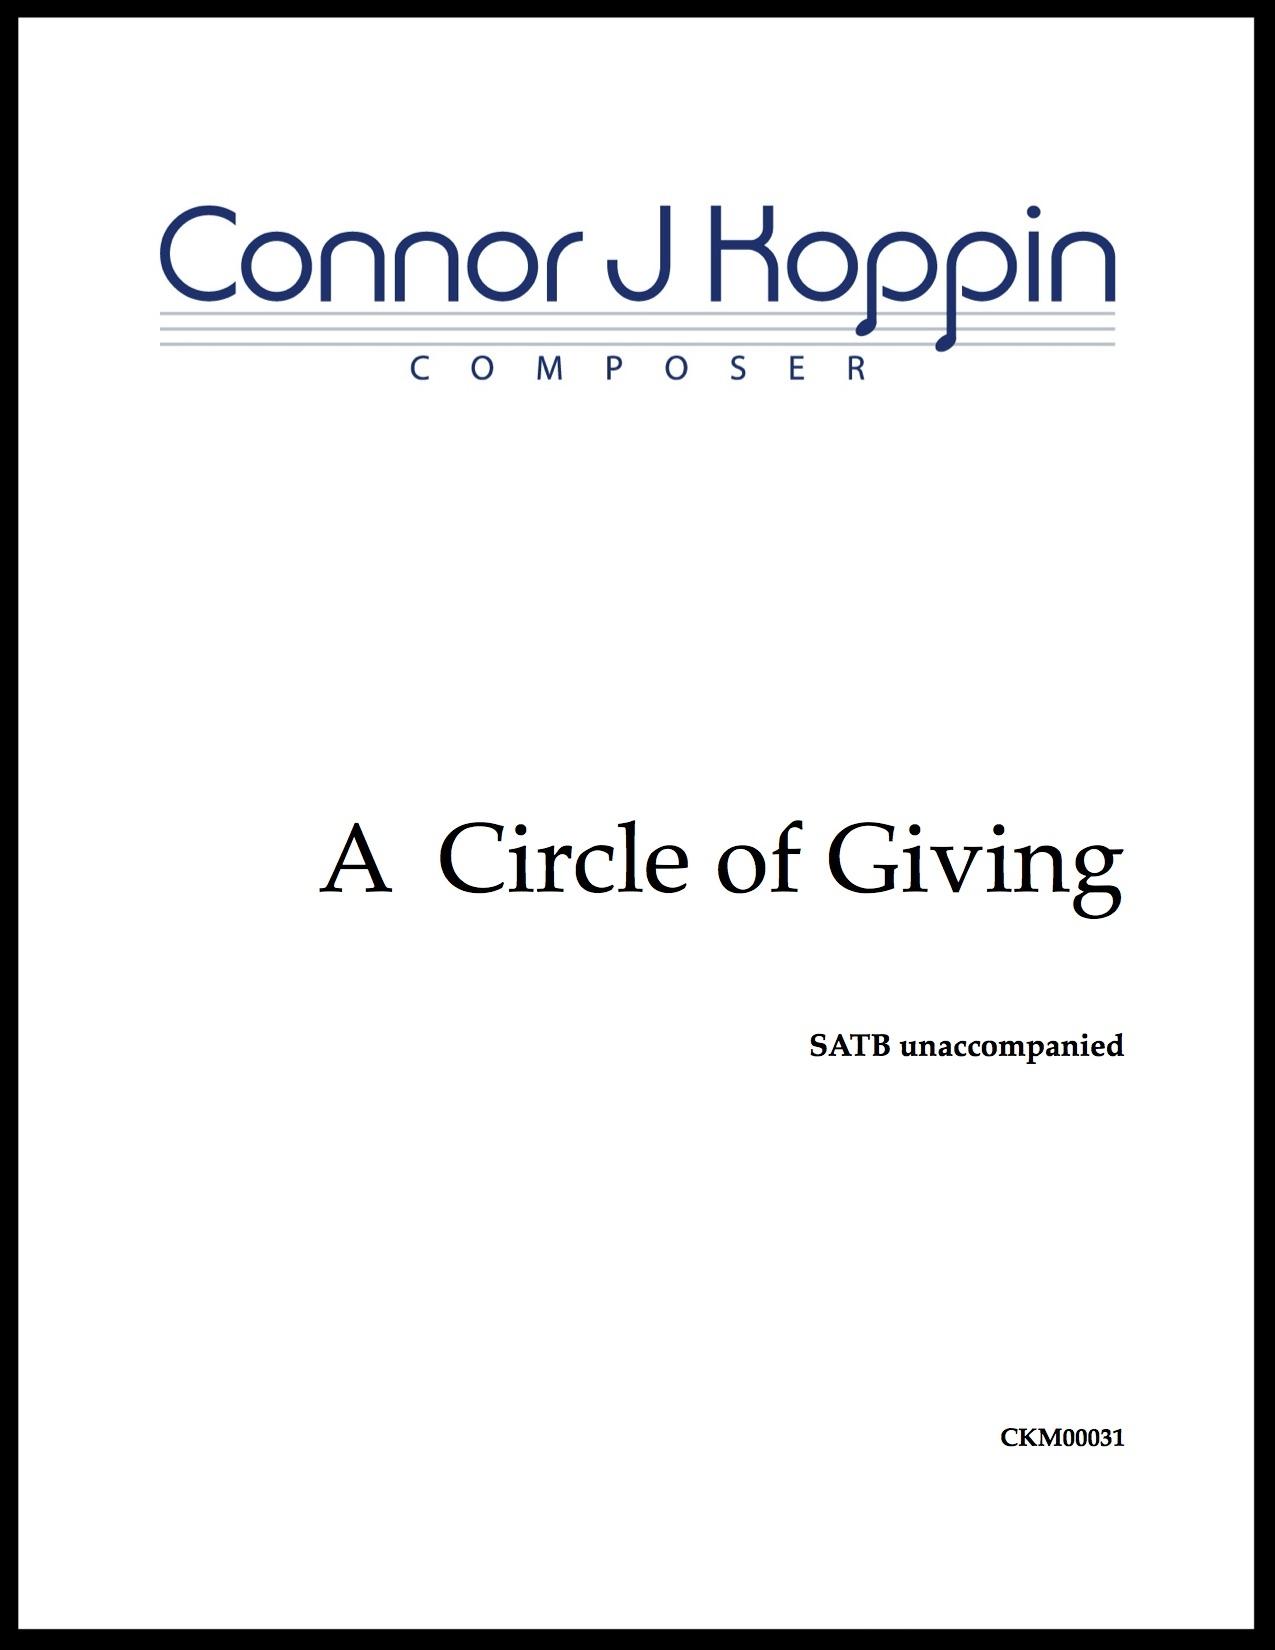 A Circle of Giving cover image jpeg.jpg